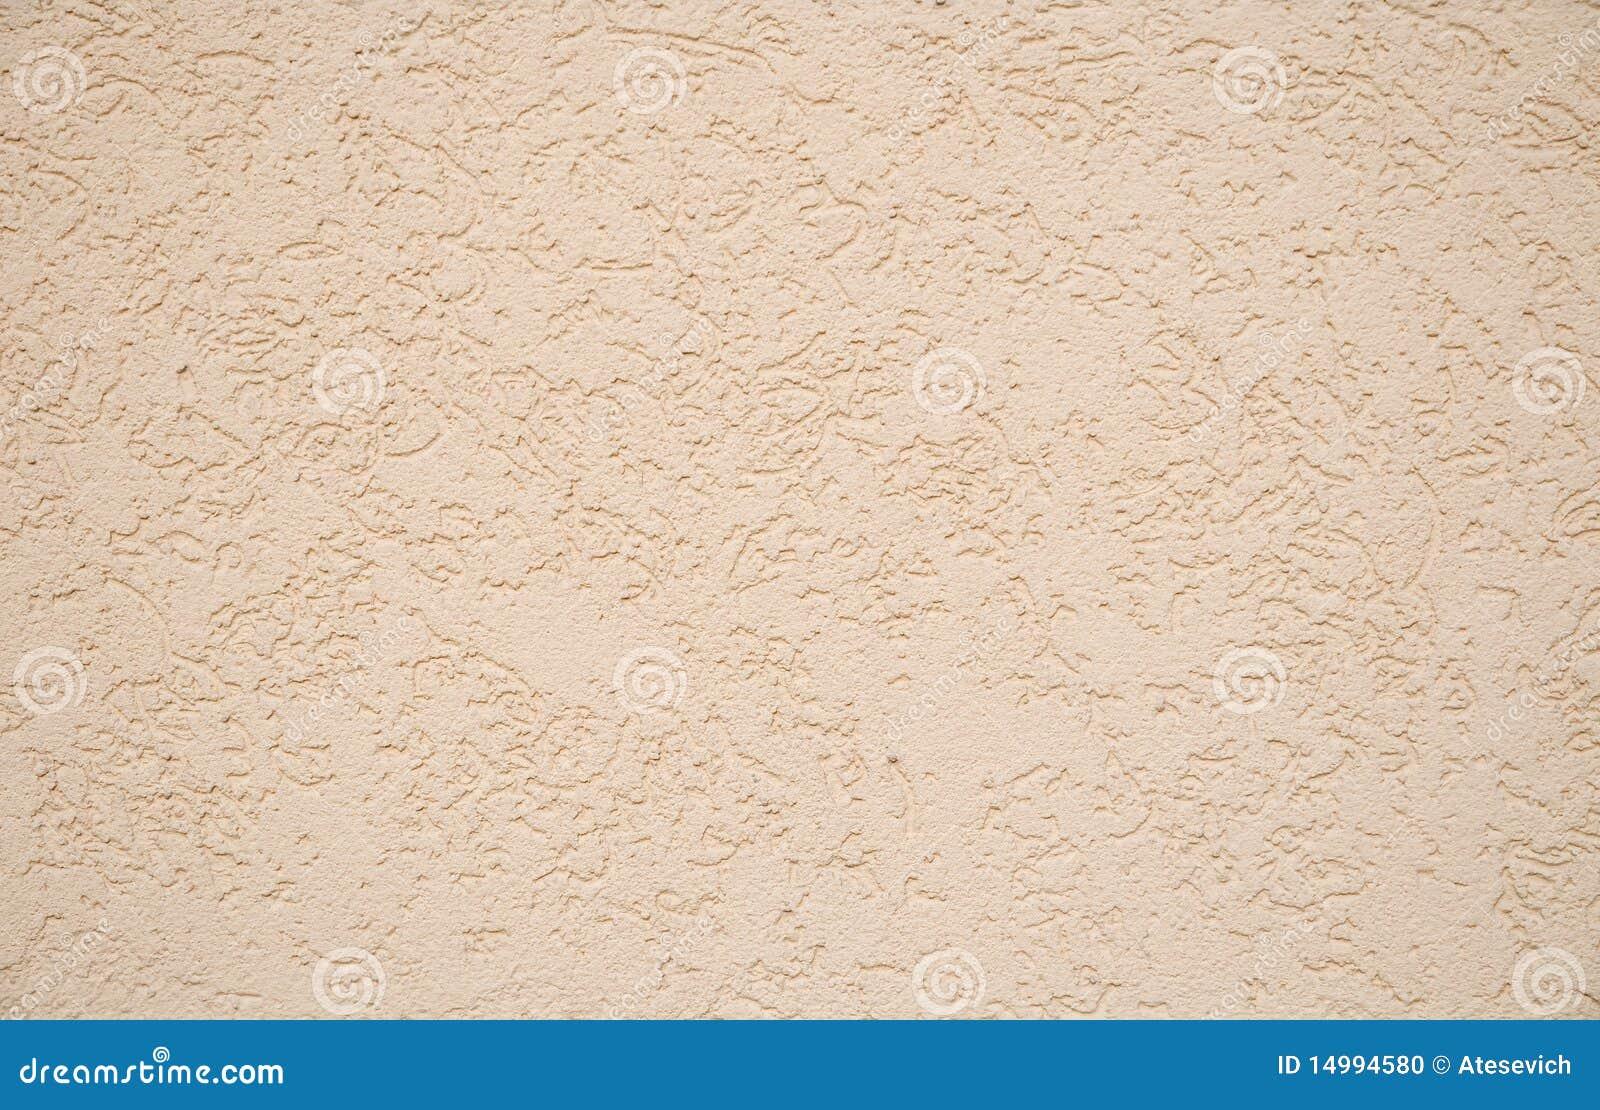 fond beige granuleux de mur photo stock image 14994580. Black Bedroom Furniture Sets. Home Design Ideas